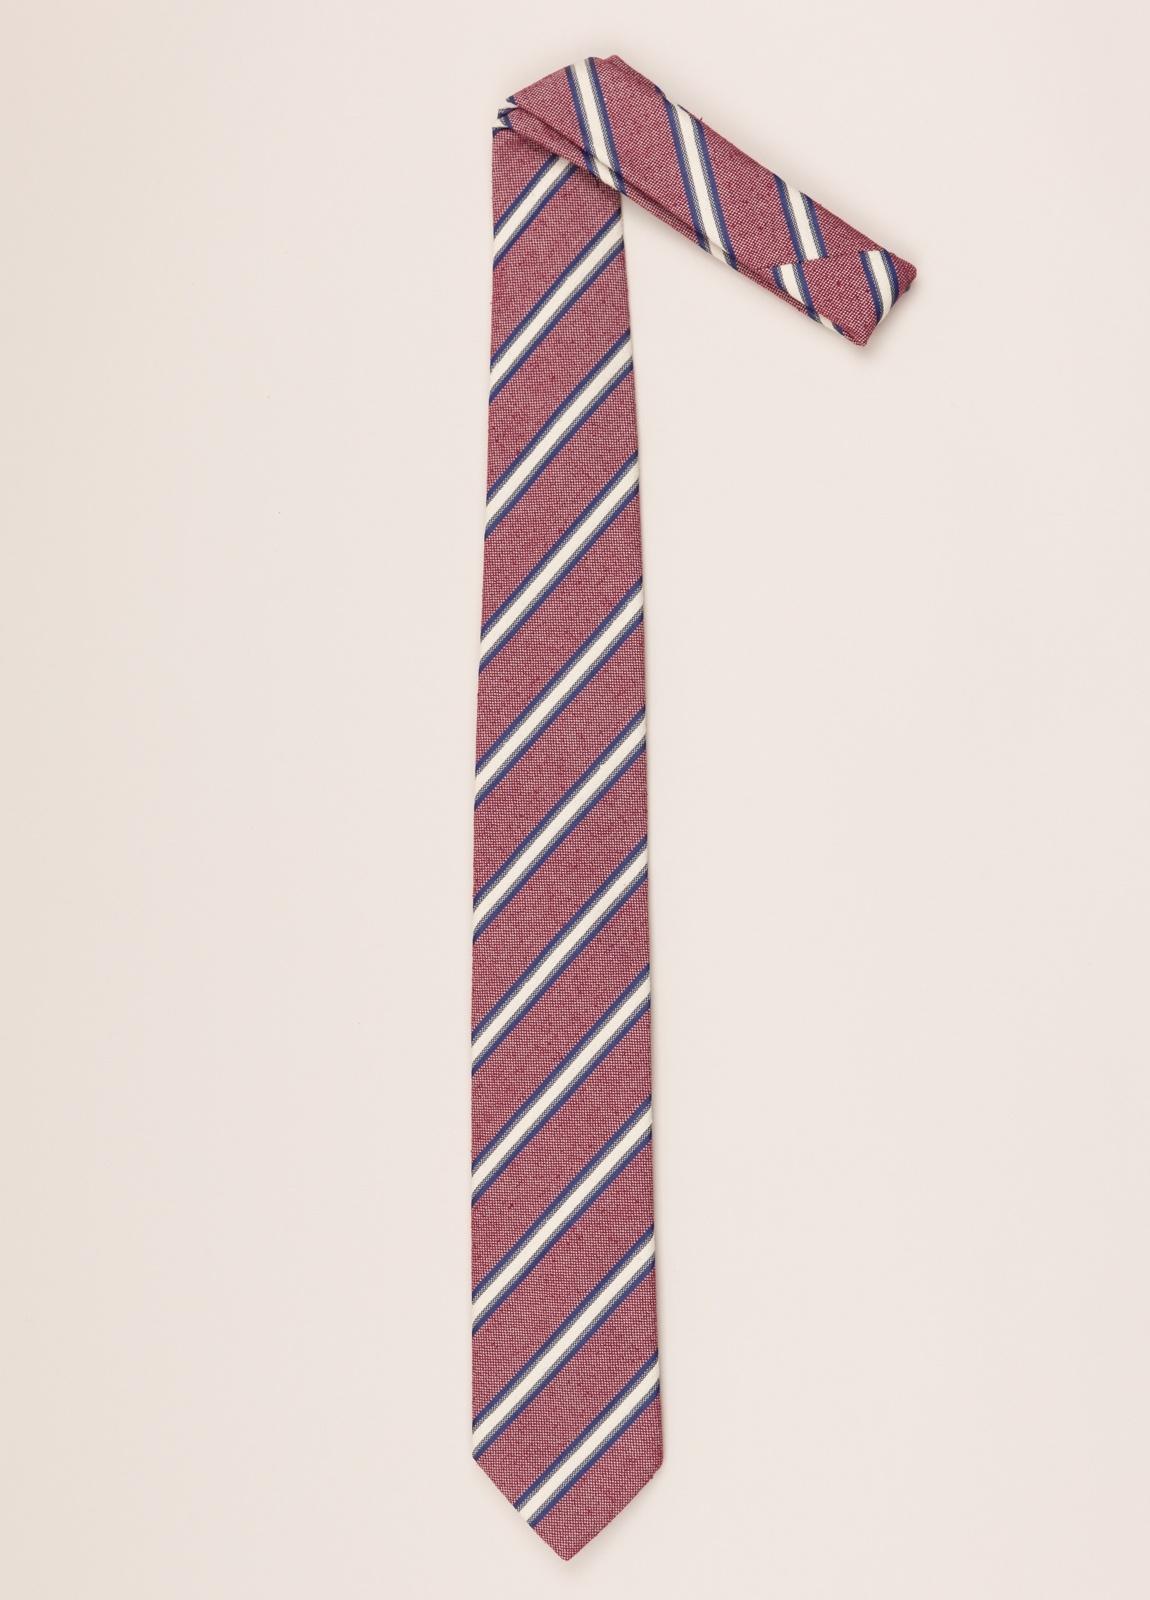 Corbata FUREST COLECCIÓN rayas granate - Ítem1